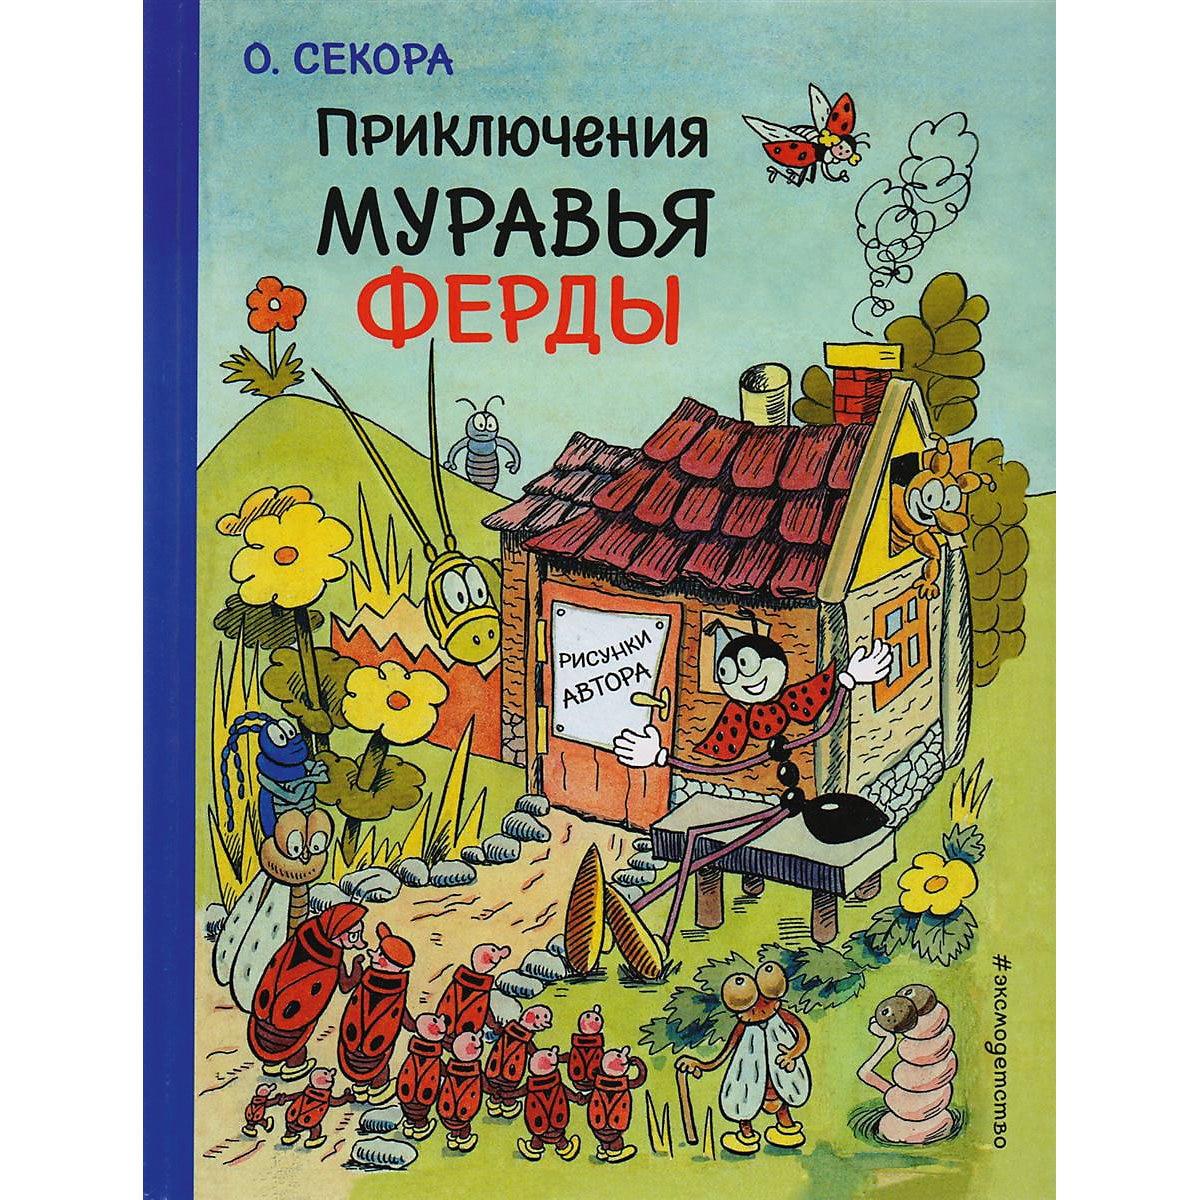 Books EKSMO 7932301 Children Education Encyclopedia Alphabet Dictionary Book For Baby MTpromo